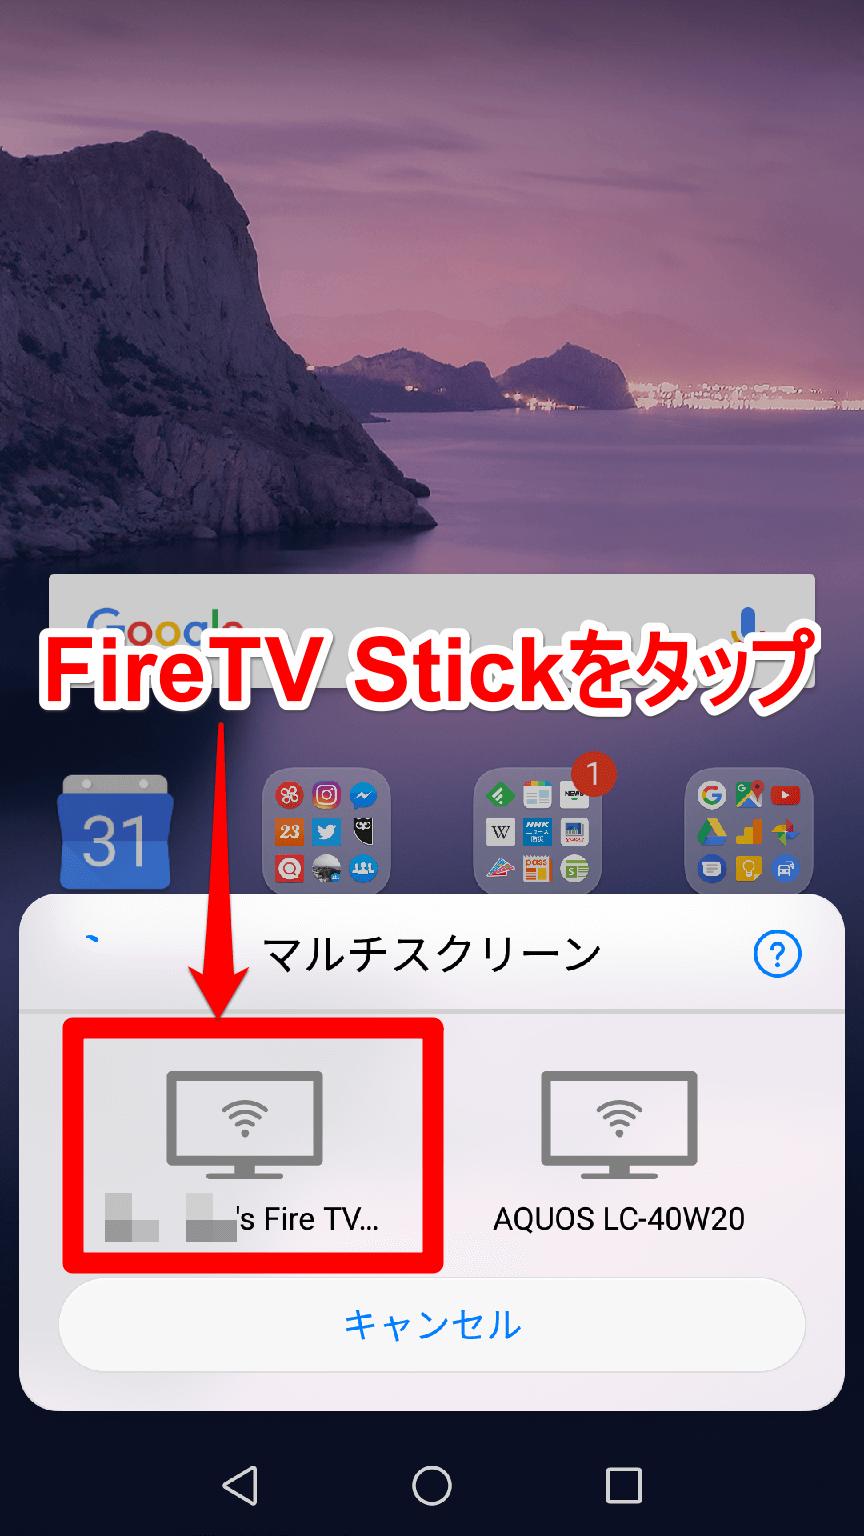 Android(アンドロイド)スマートフォンでマルチスクリーンの端末の検索結果画面